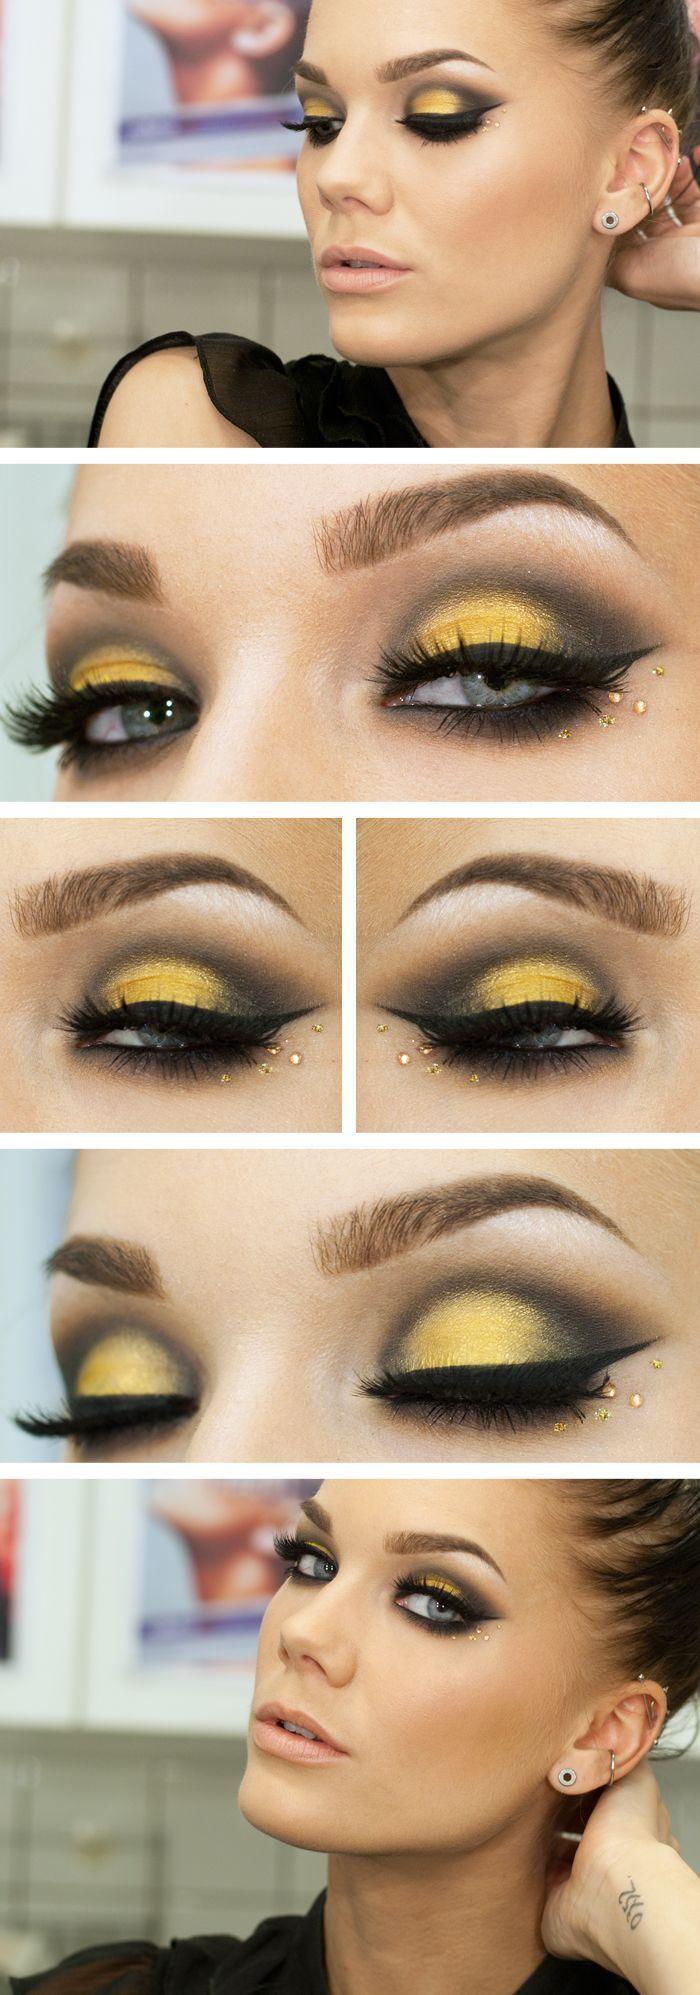 11 Everyday Makeup Tutorials And Ideas For Women Pretty Designs Everyday Makeup Tutorials Everyday Makeup Eye Makeup [ 1995 x 700 Pixel ]